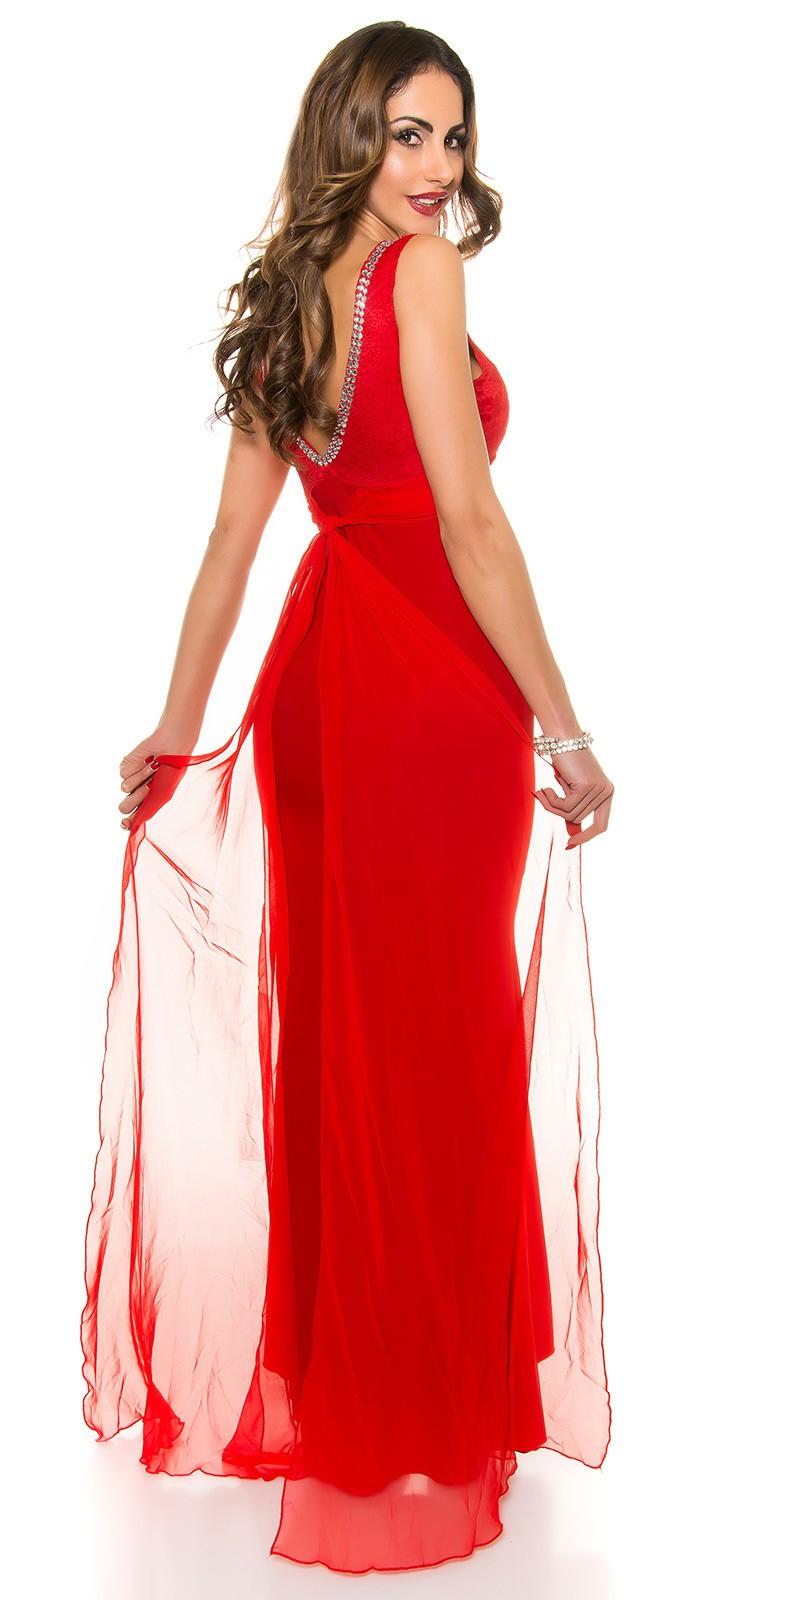 cf92225226db Obrázok pre Spoločenské šaty s čipkou a mašľou   červené ...